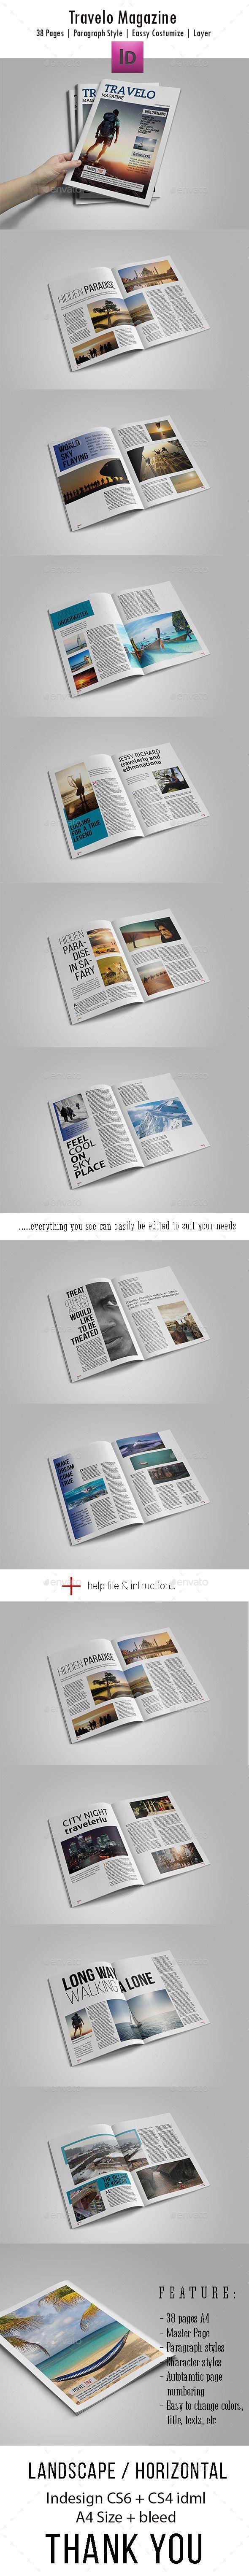 Travel Magazine Template InDesign INDD #design Download: http://graphicriver.net/item/travel-magazine/13402353?ref=ksioks